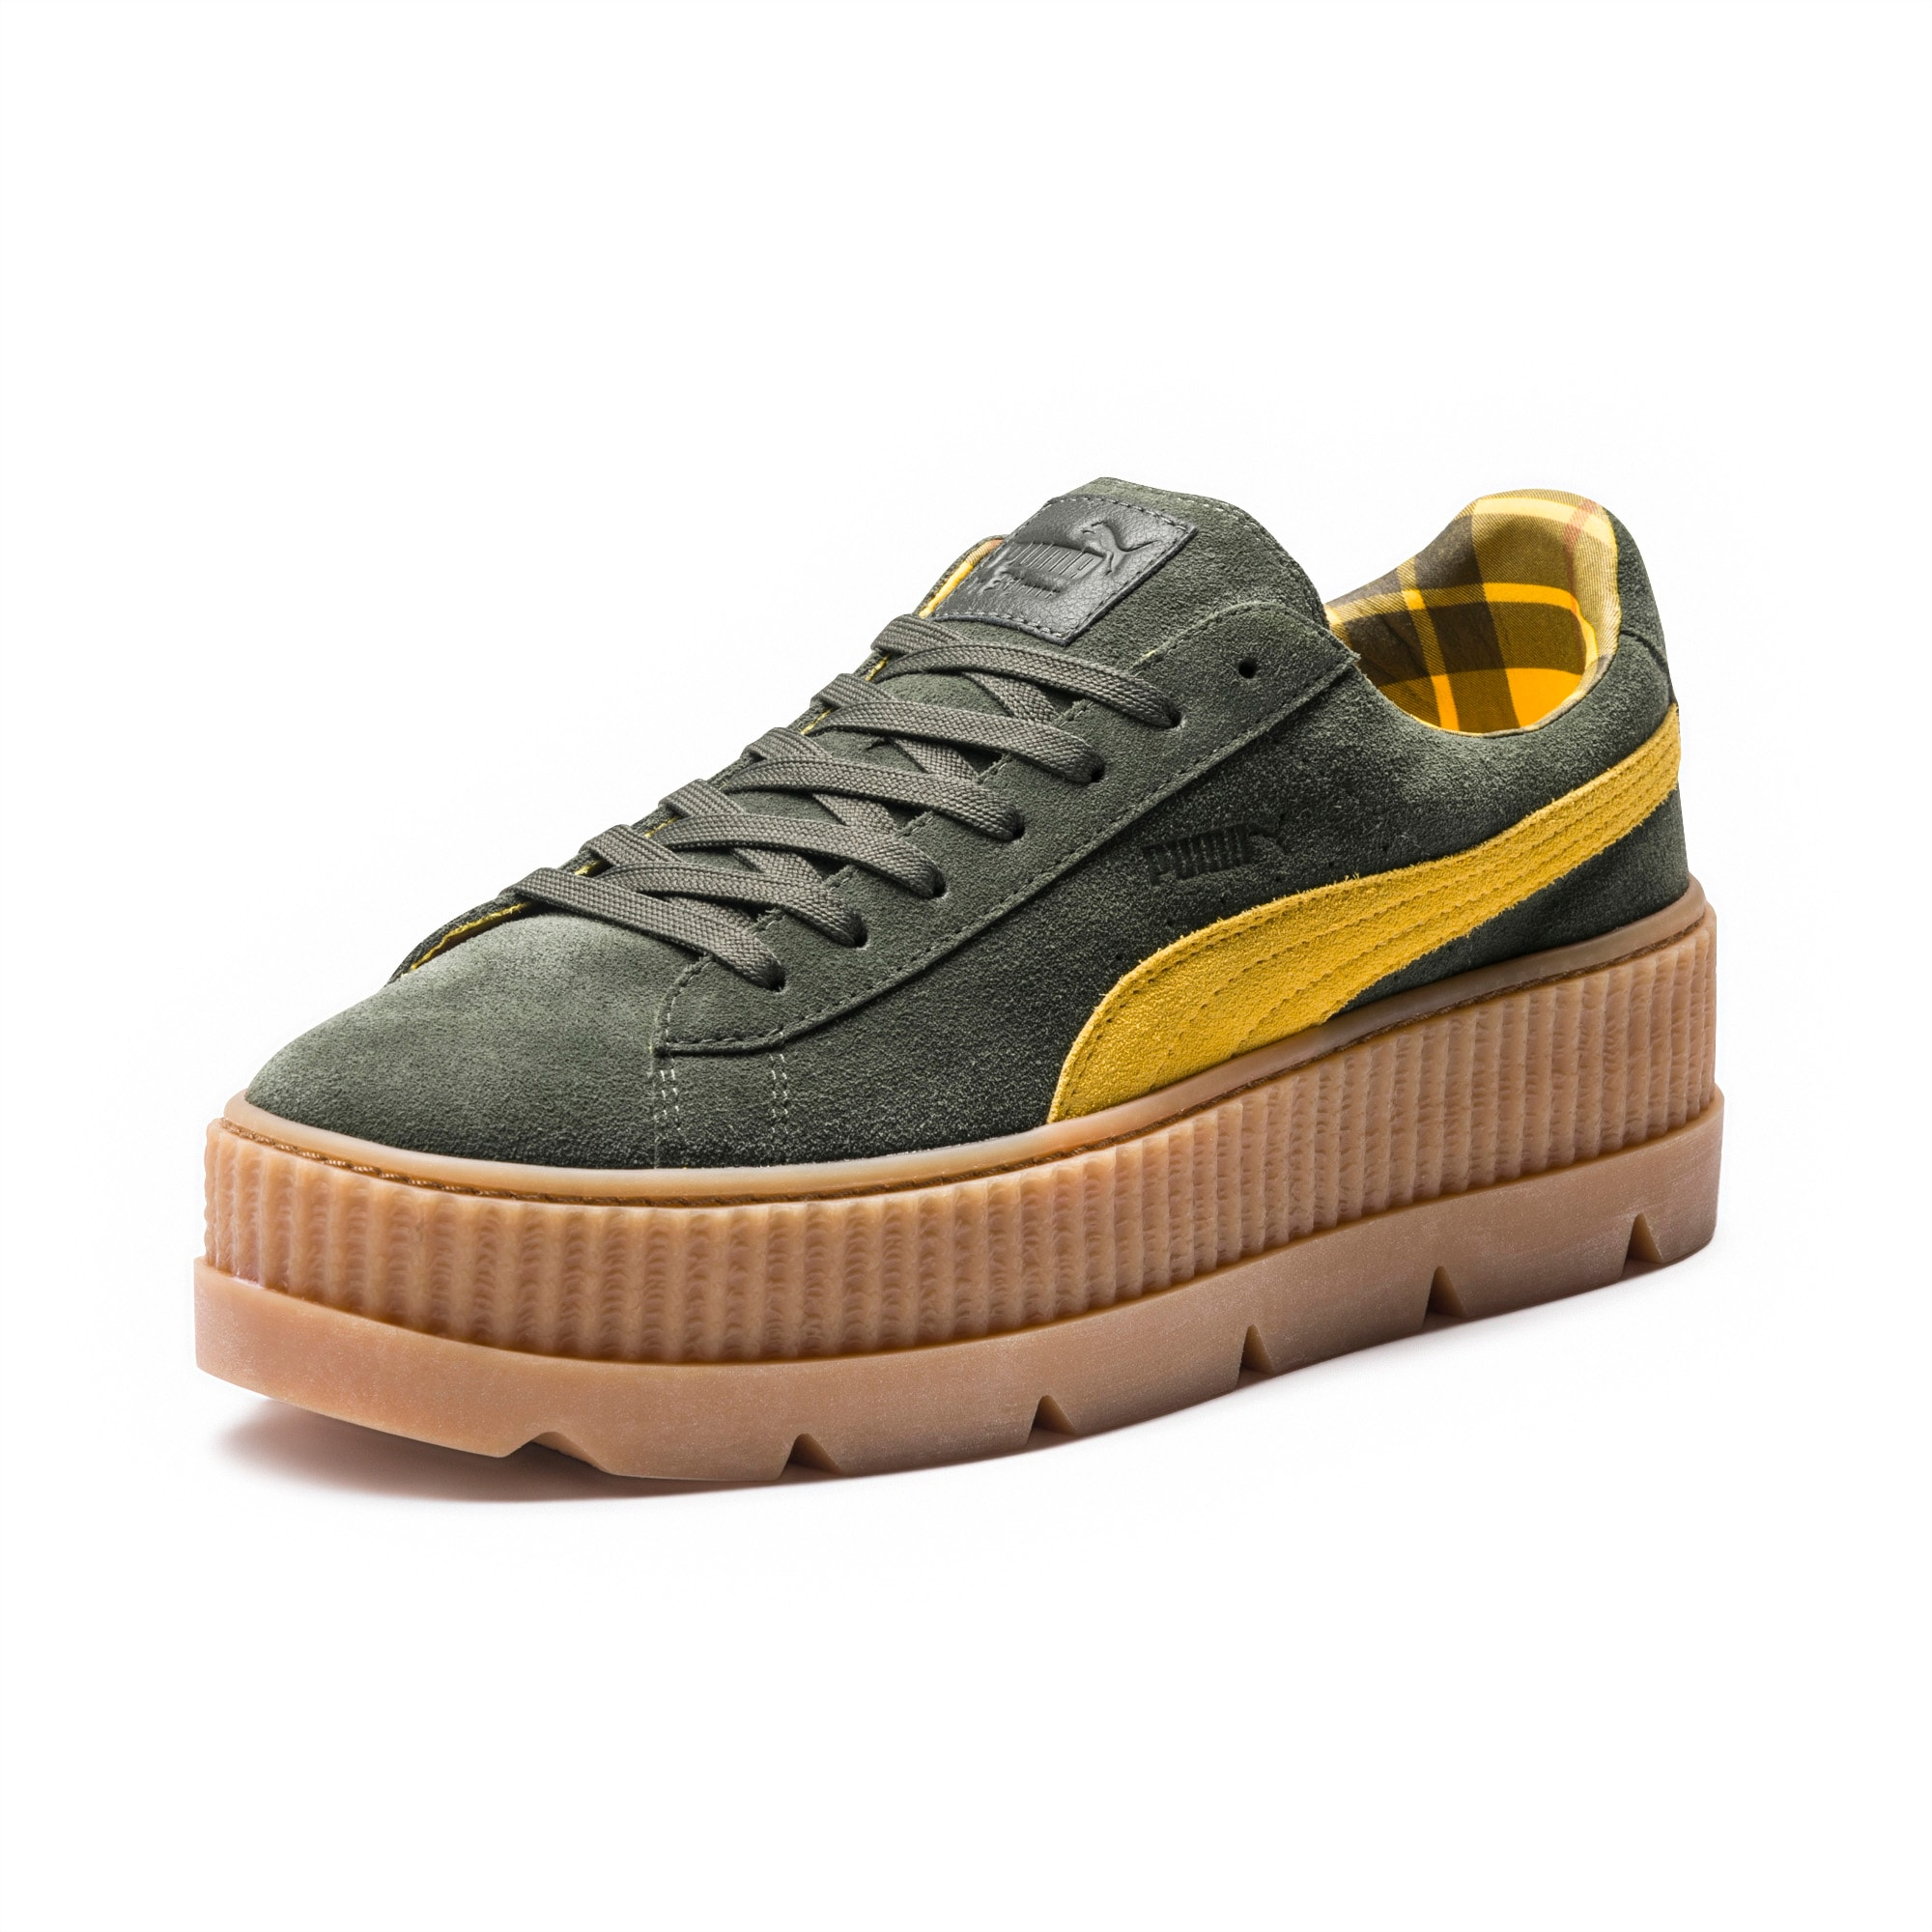 FENTY Puma x Rihanna Women's Suede Cleated Platform Sneakers